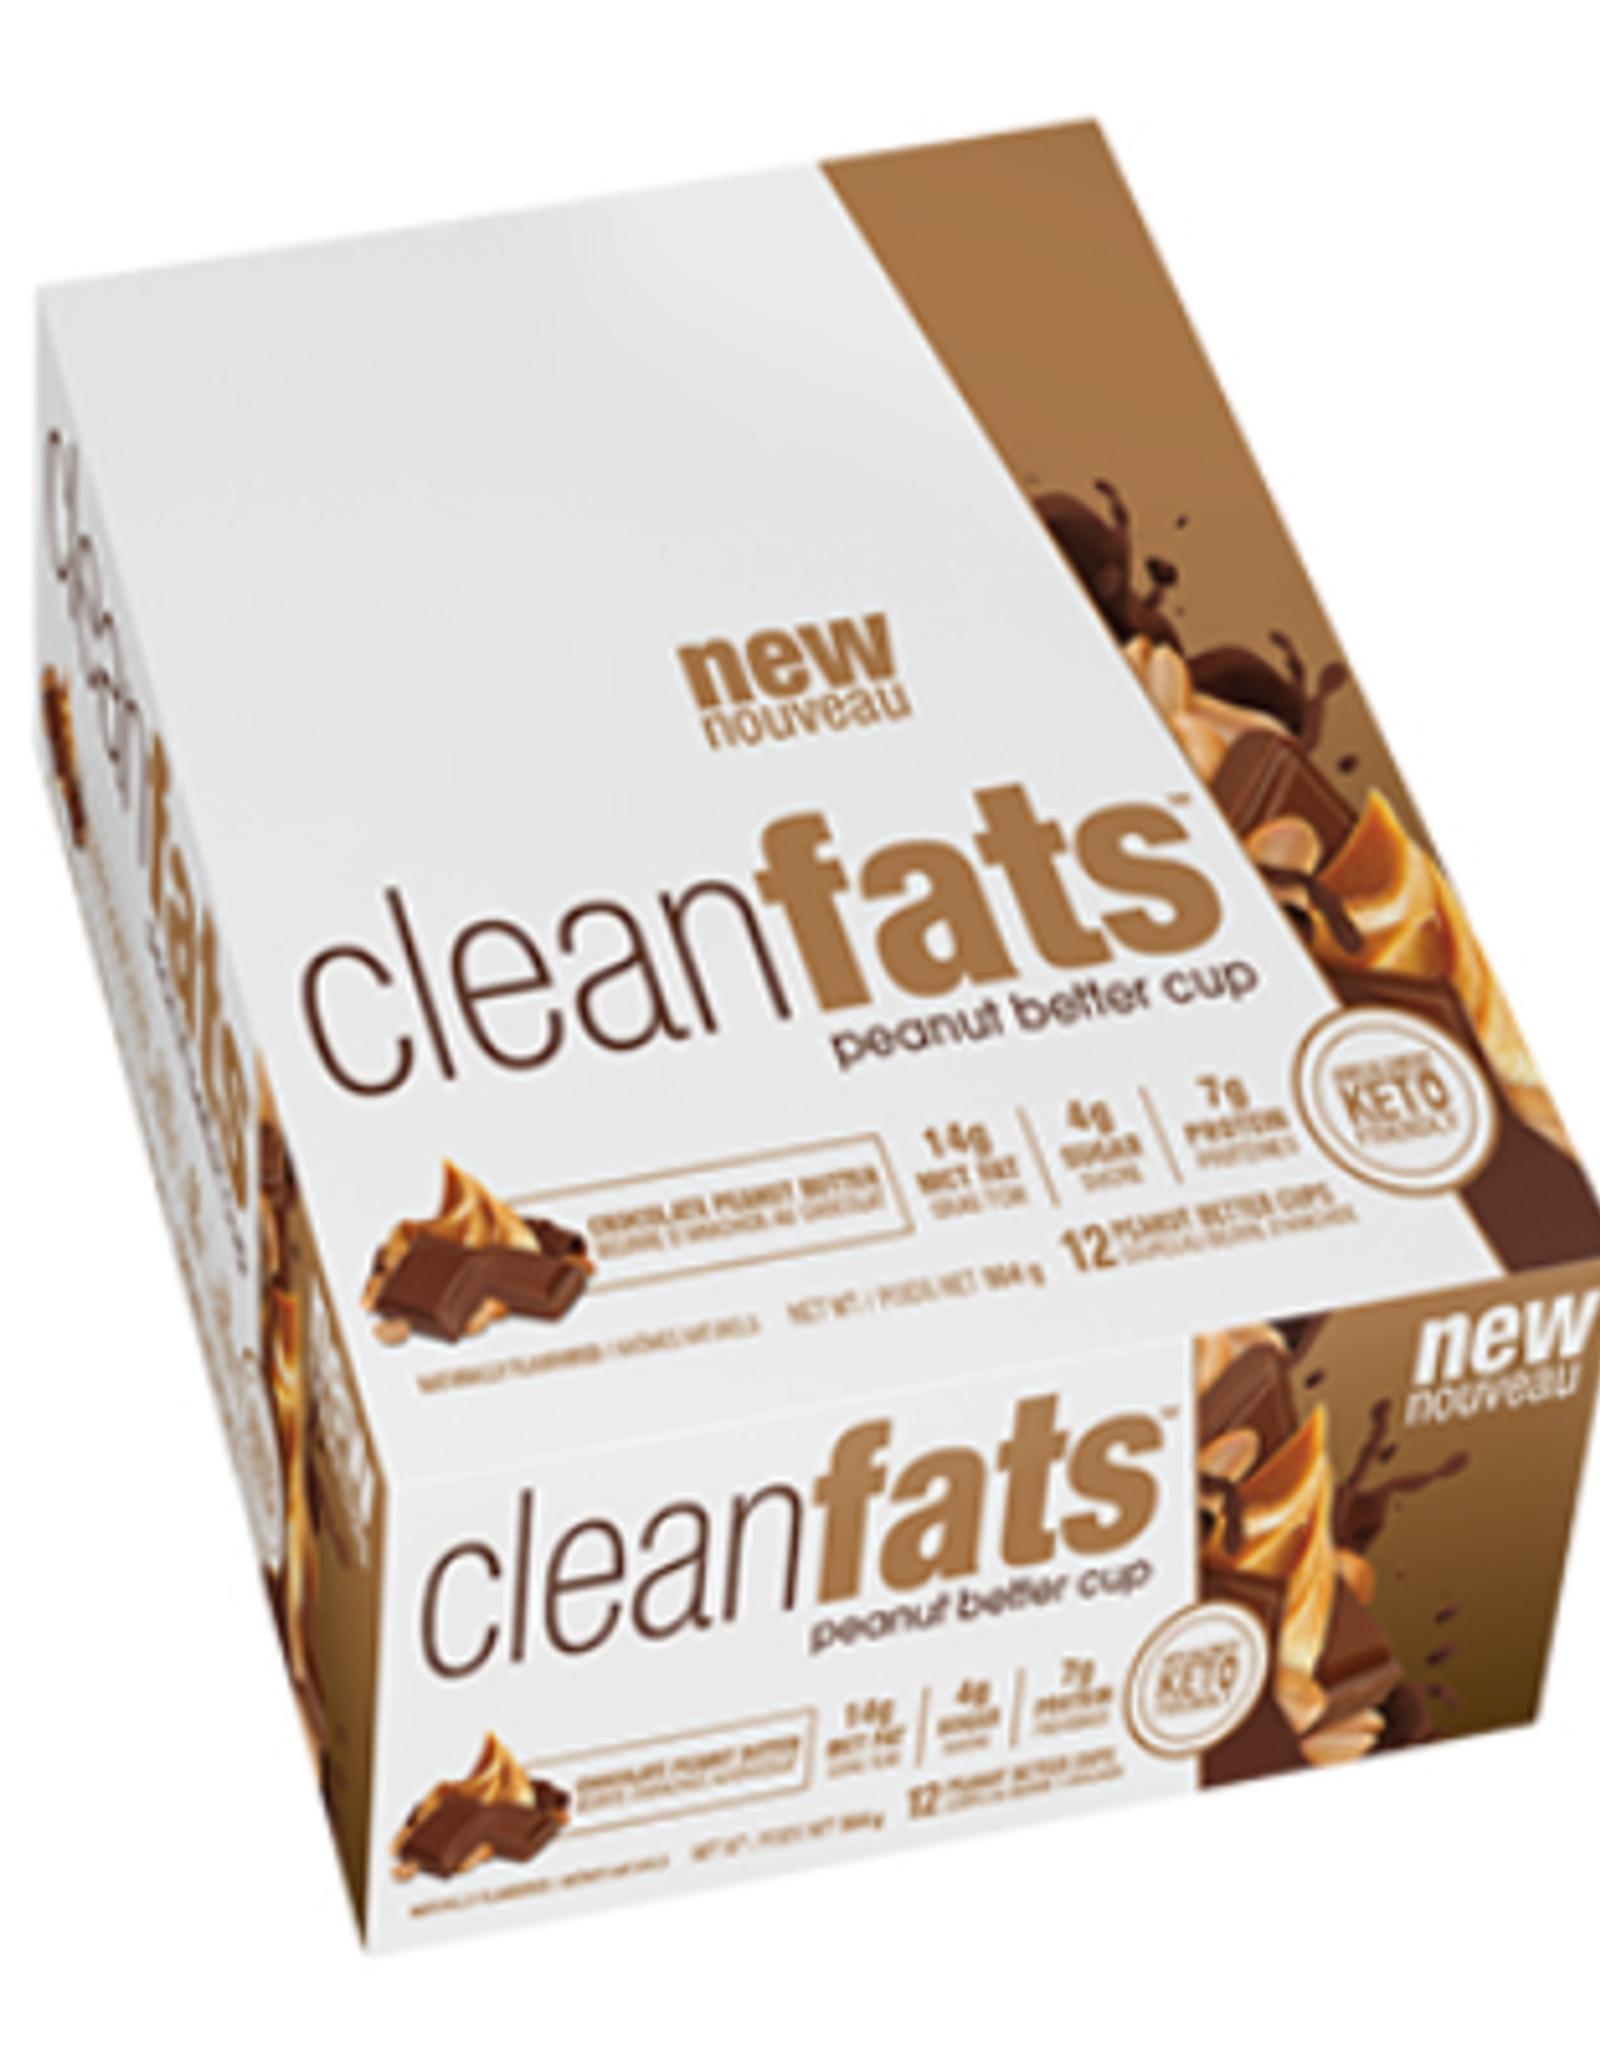 Clean fats Clean Fats - Peanut Butter Choc, 42g